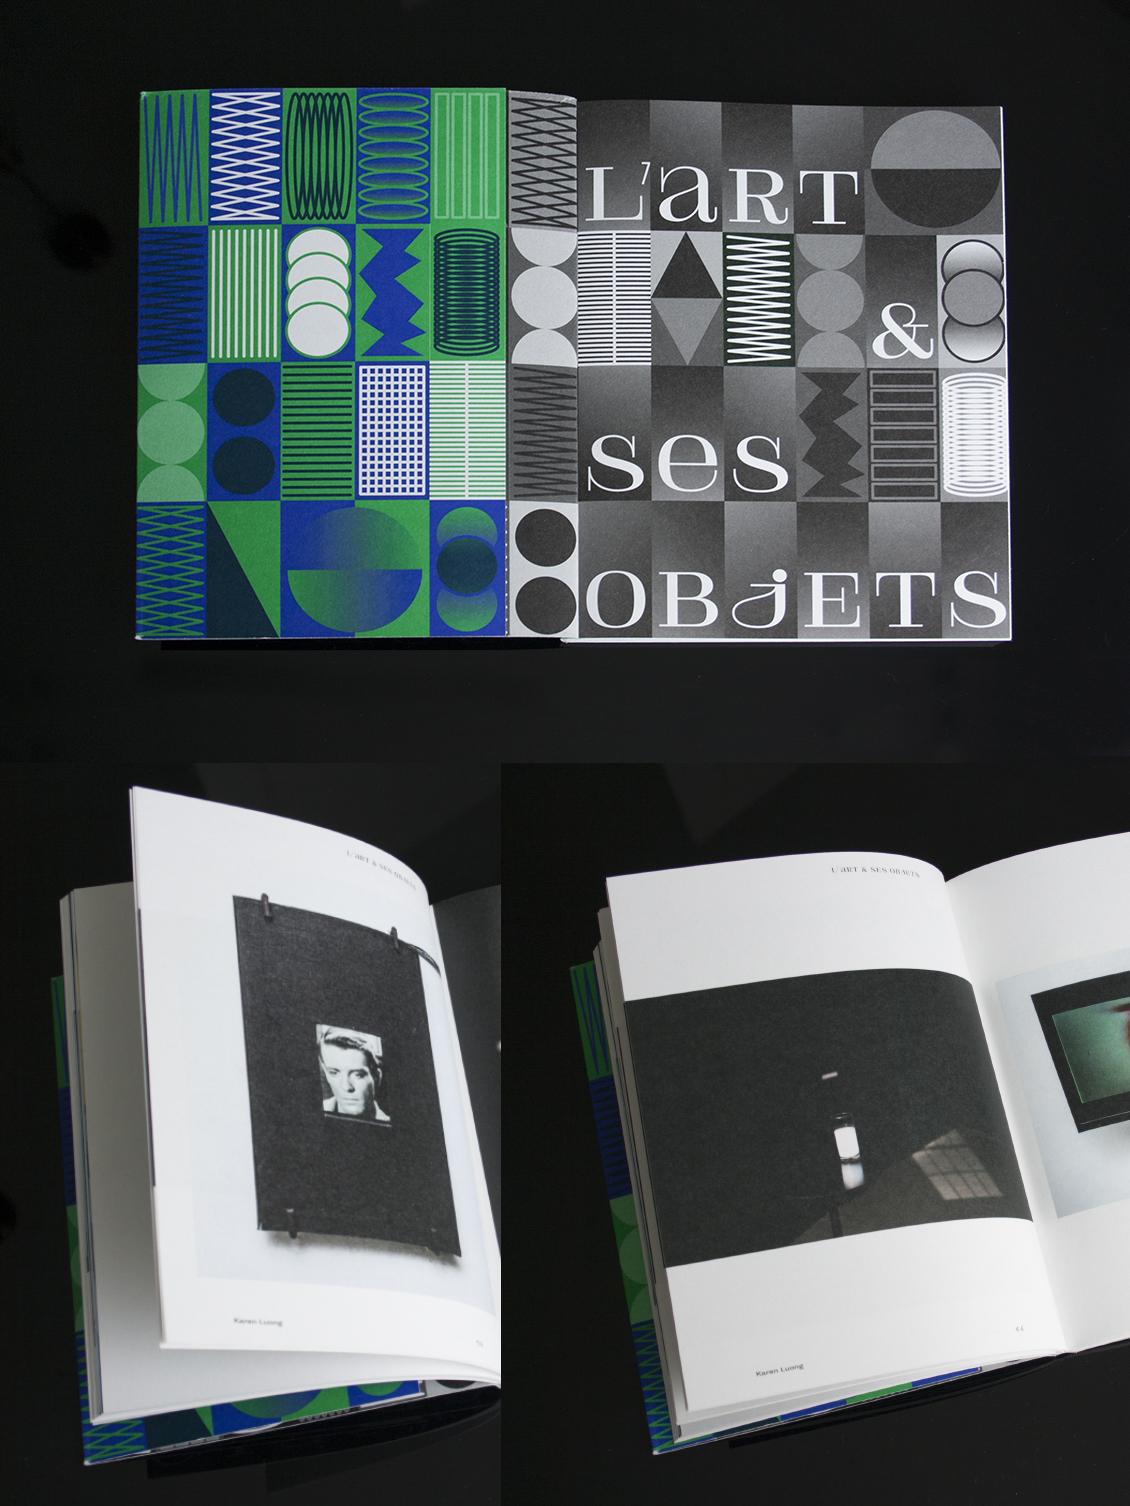 karen-luong-art-&-ses-objets-galerie-episodique-gaya-goldcymer-jonathan-taieb-2017-paris